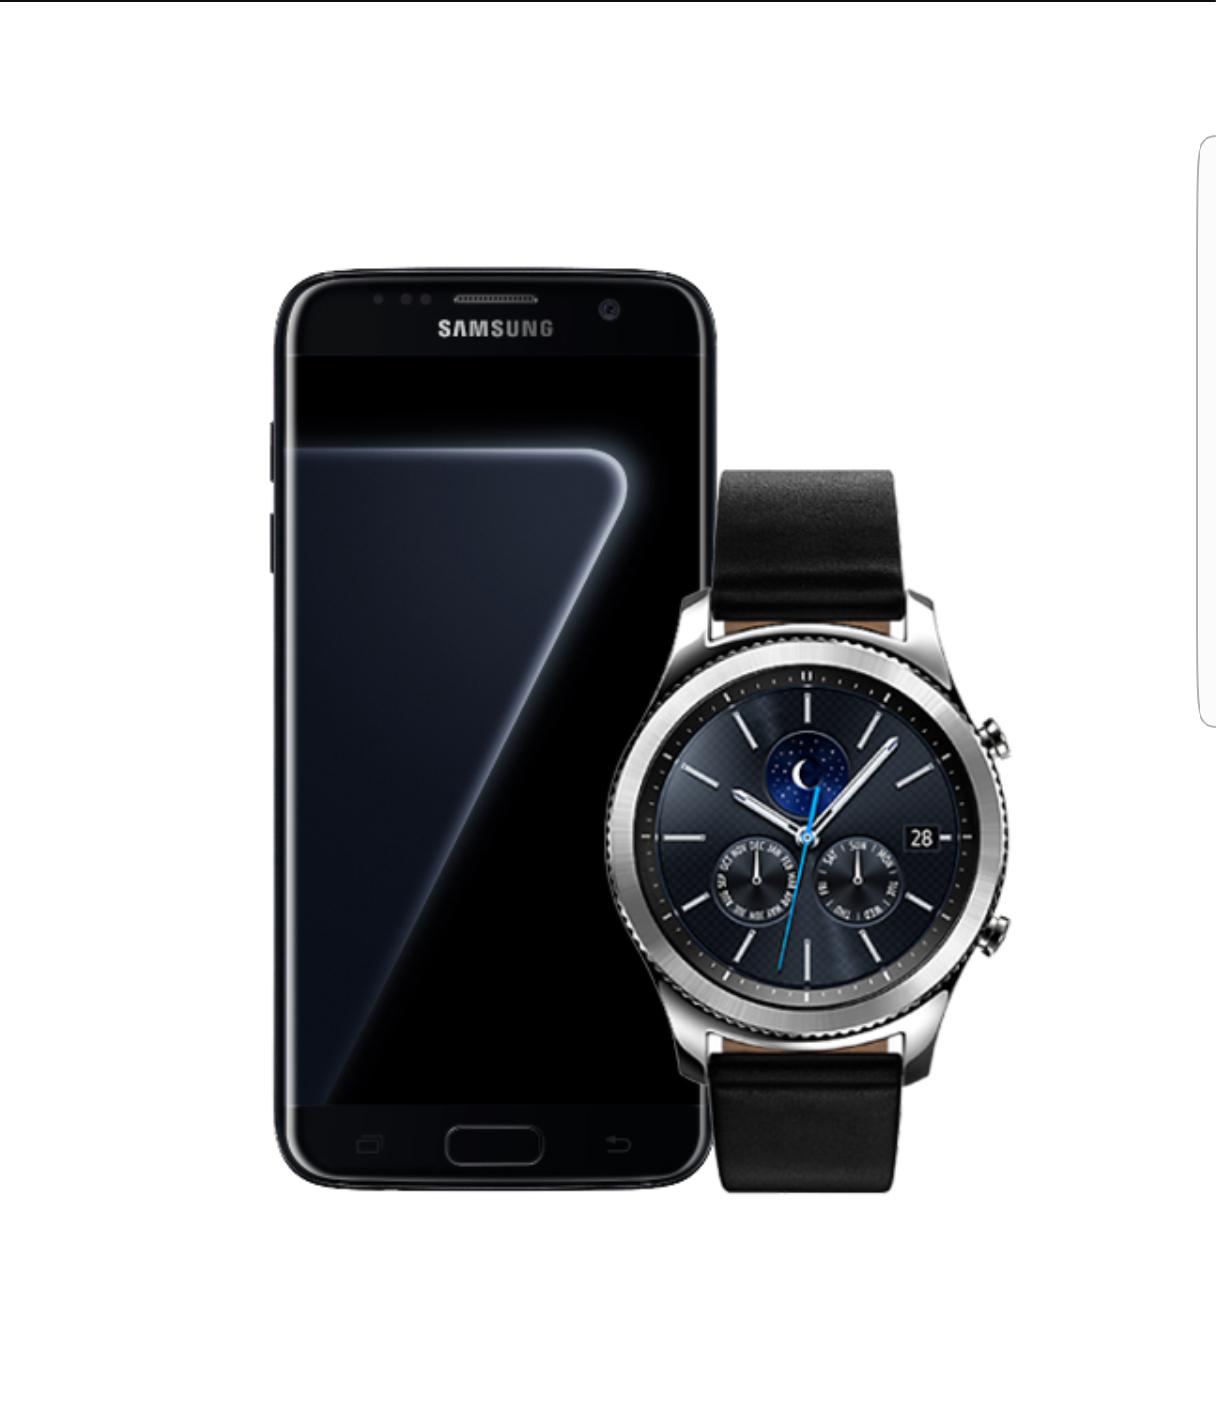 Samsung Galaxy S7 Edge  + Samsung Galaxy Gear S3 classic